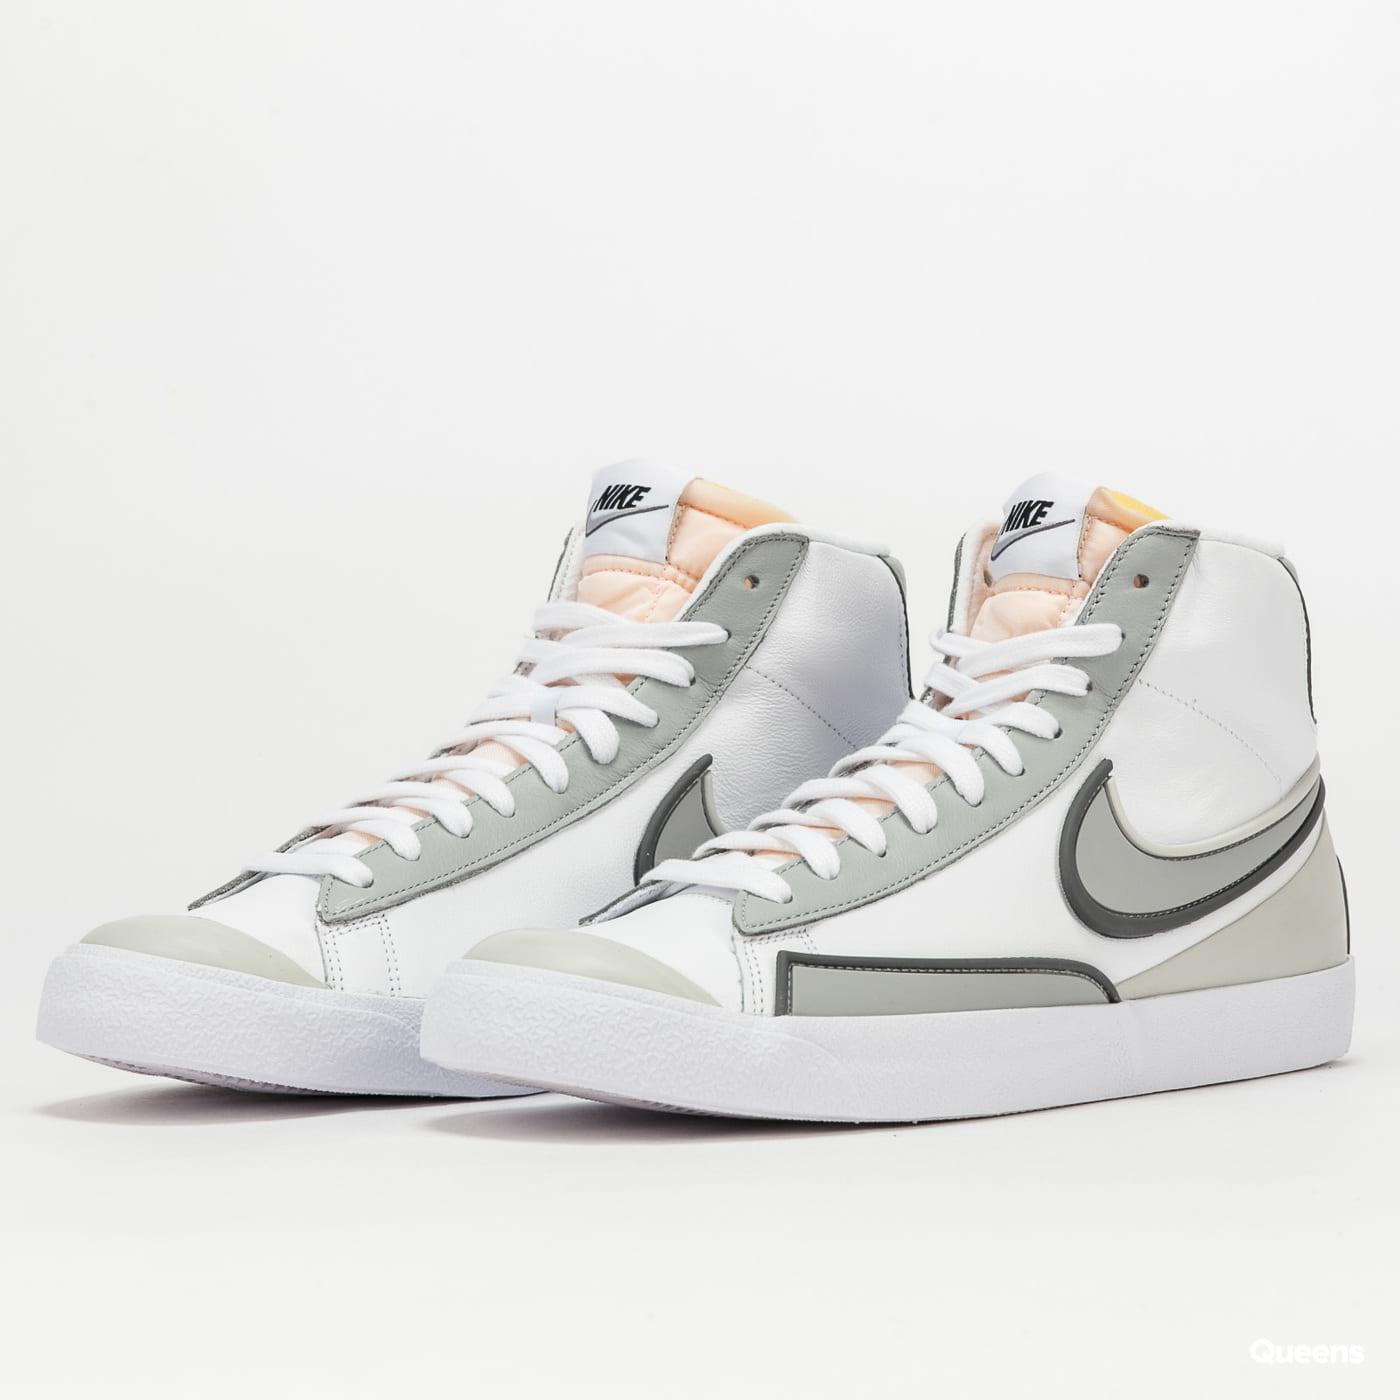 Nike Blazer Mid '77 Infinite white / lt smoke grey - iron grey